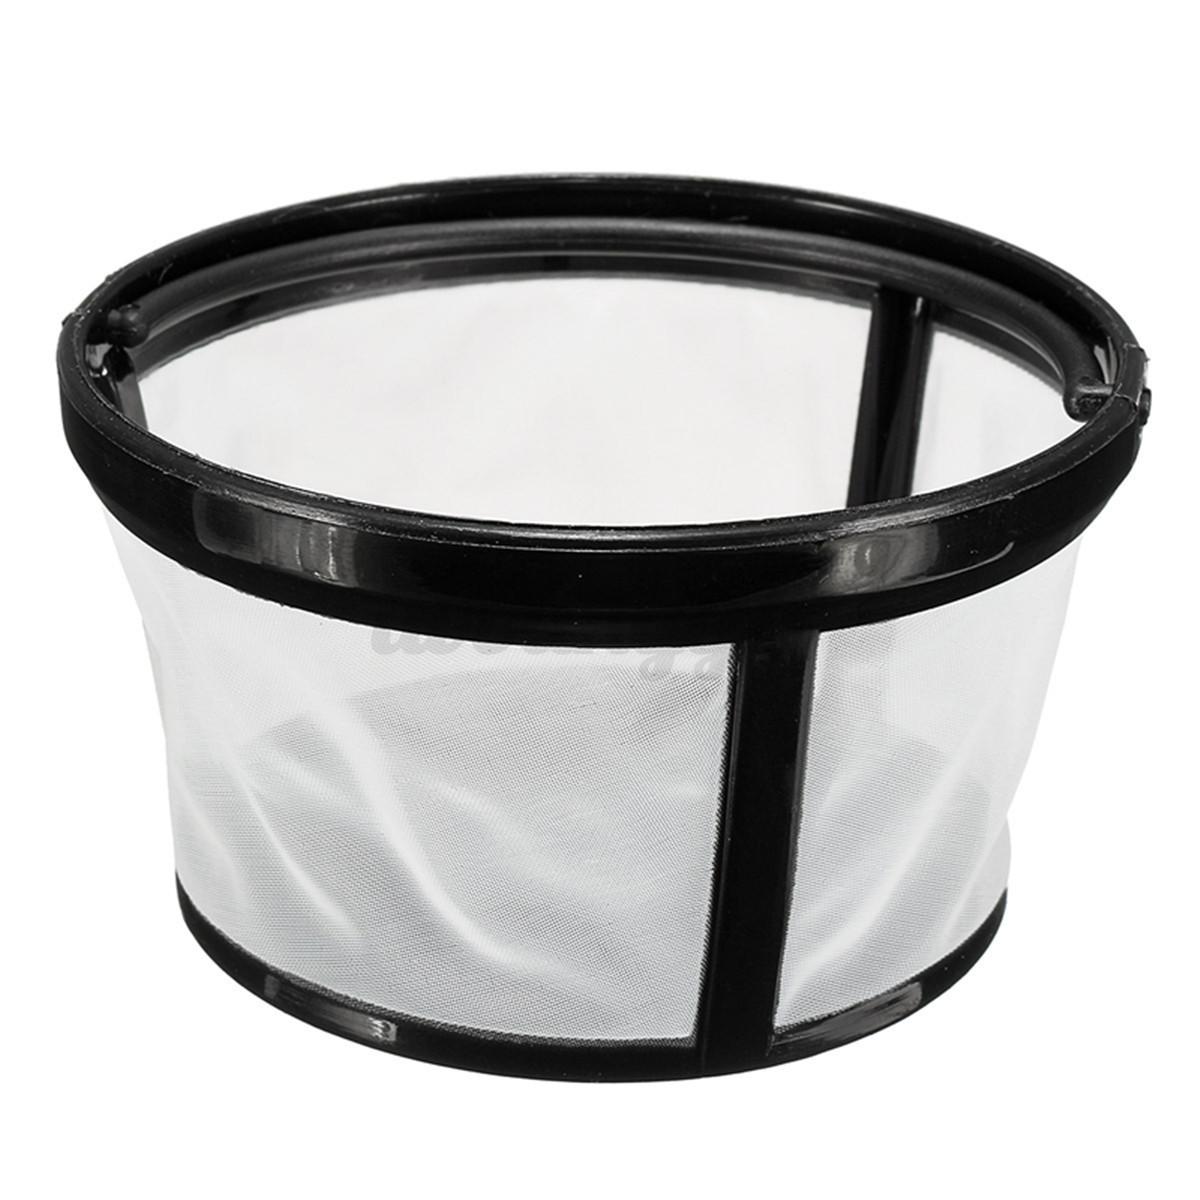 71D74777269E919876AF73D6739E53536633019ACFD29C9A99CBD2E3330336C8D29C83038E73D2CACC469363C89173C8CD66C6C8A033 Mr Coffee Permanent Filter  Cup Basket Style Permanent Coffee Filter For Mr Coffee Coffeemaker Plastic Us Ebay